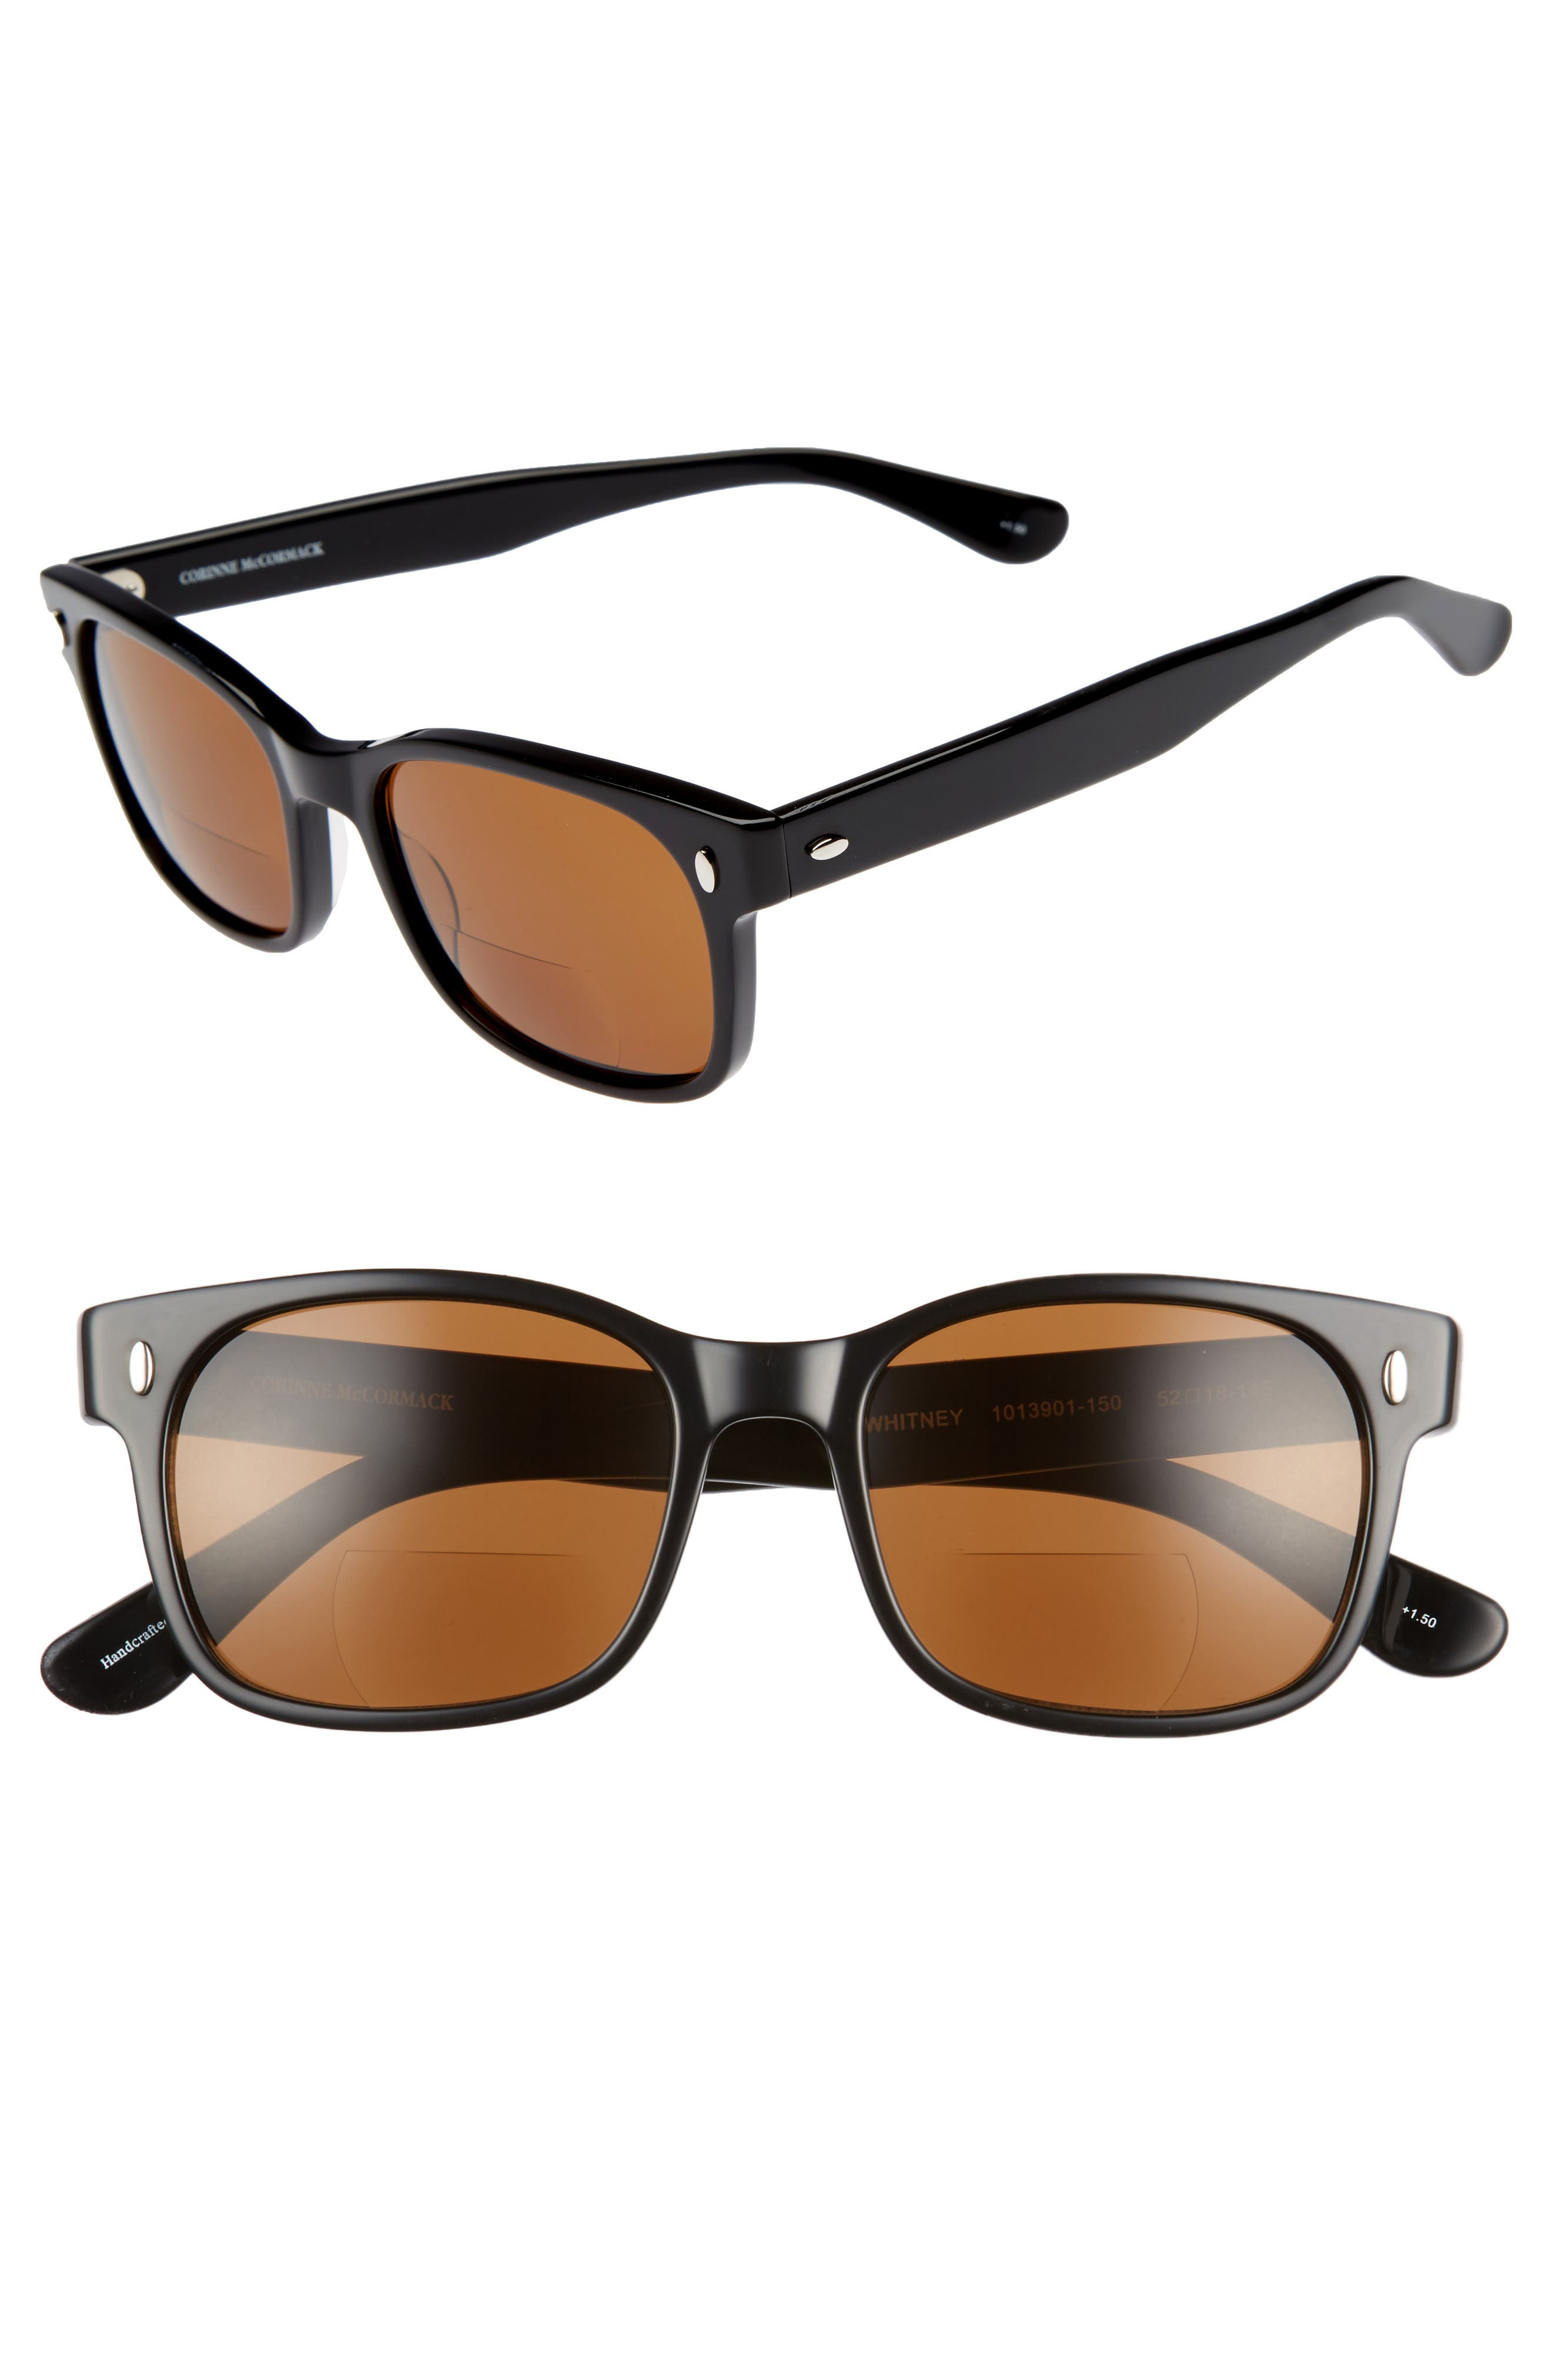 Whitney 52mm Reading Sunglasses,                         Main,                         color, Black